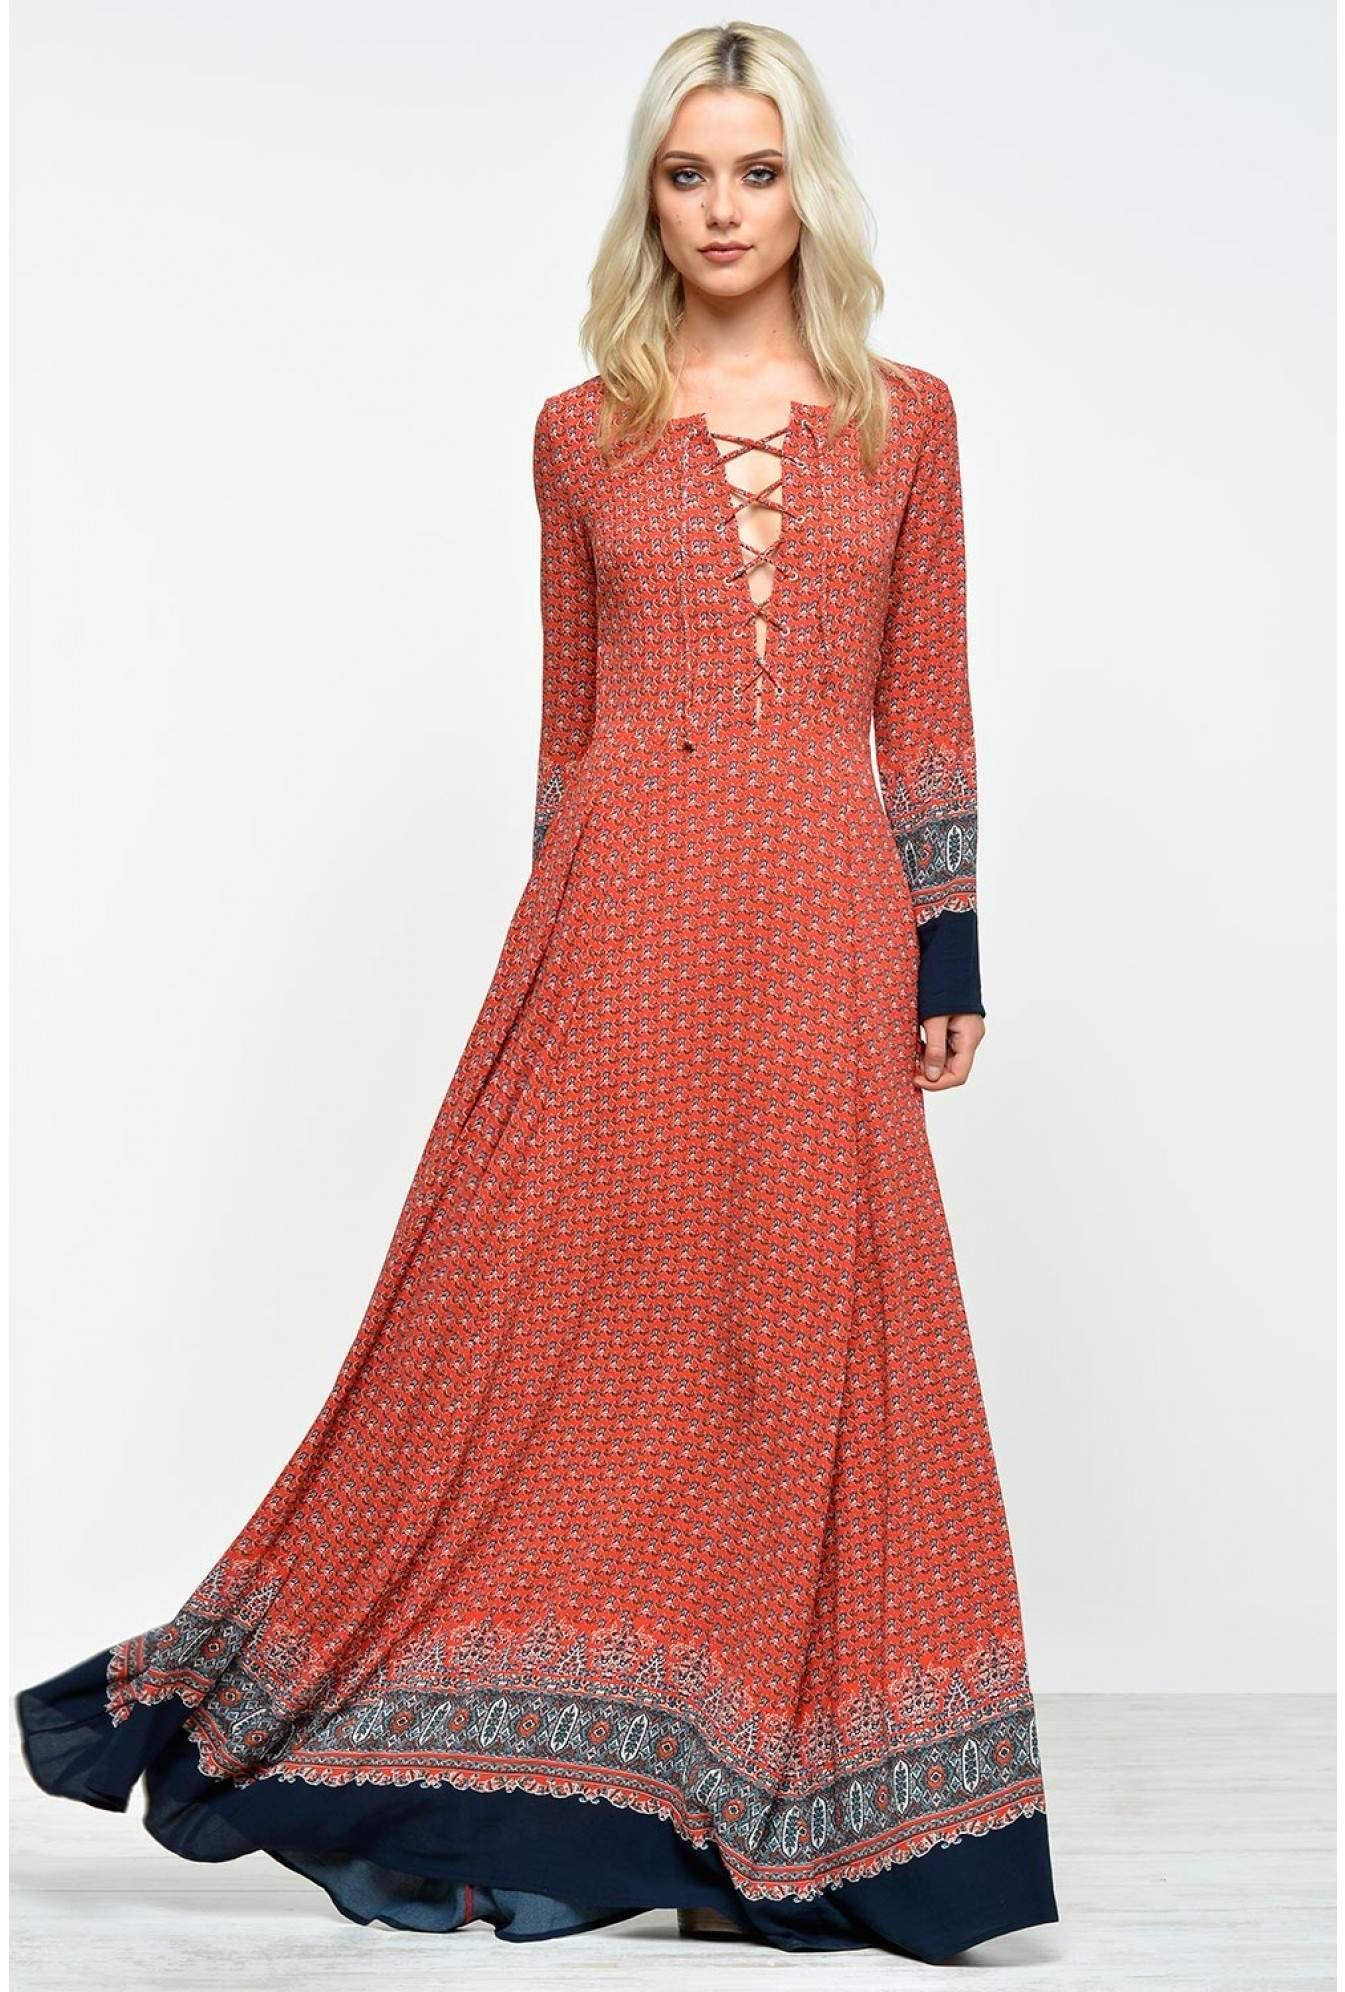 b14aa842f1 More Views. Kate Border Print Lace Up Maxi Dress. Glamorous